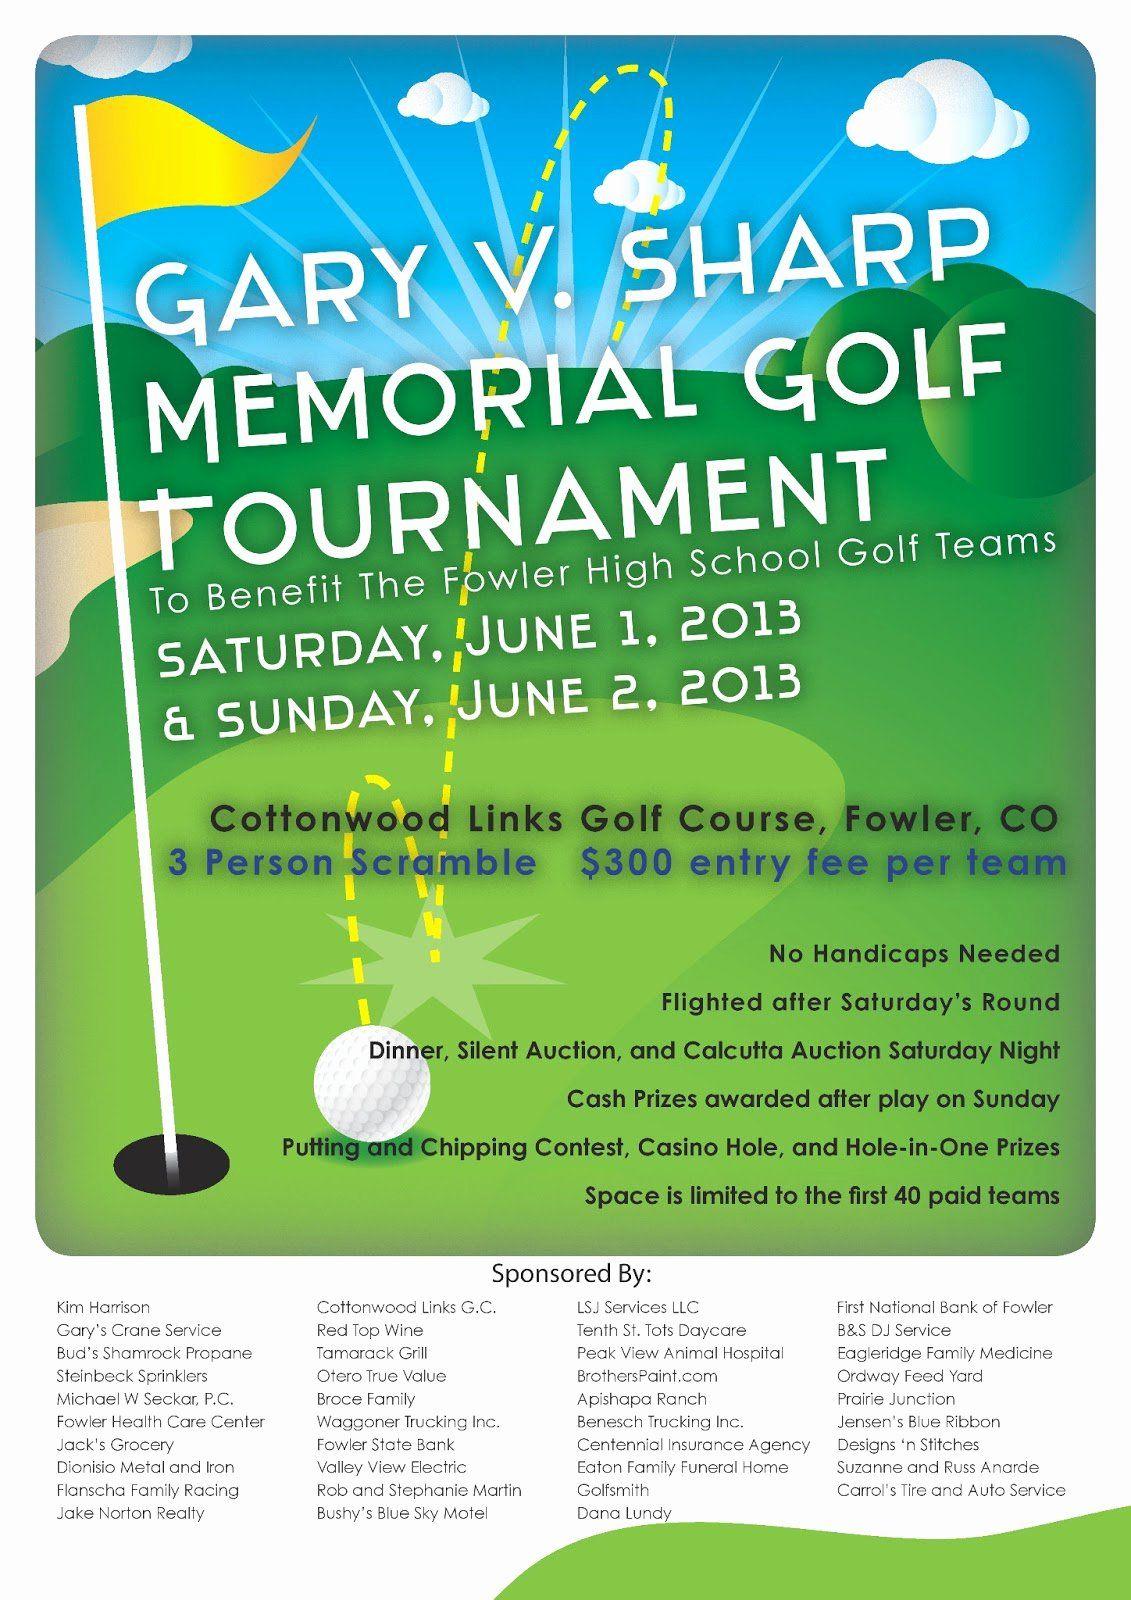 Golf Scramble Flyer Template Fresh Gary V Sharp Memorial Golf Tournament Tournament Flyer Flyers Template Golf Tournament Flyer Template